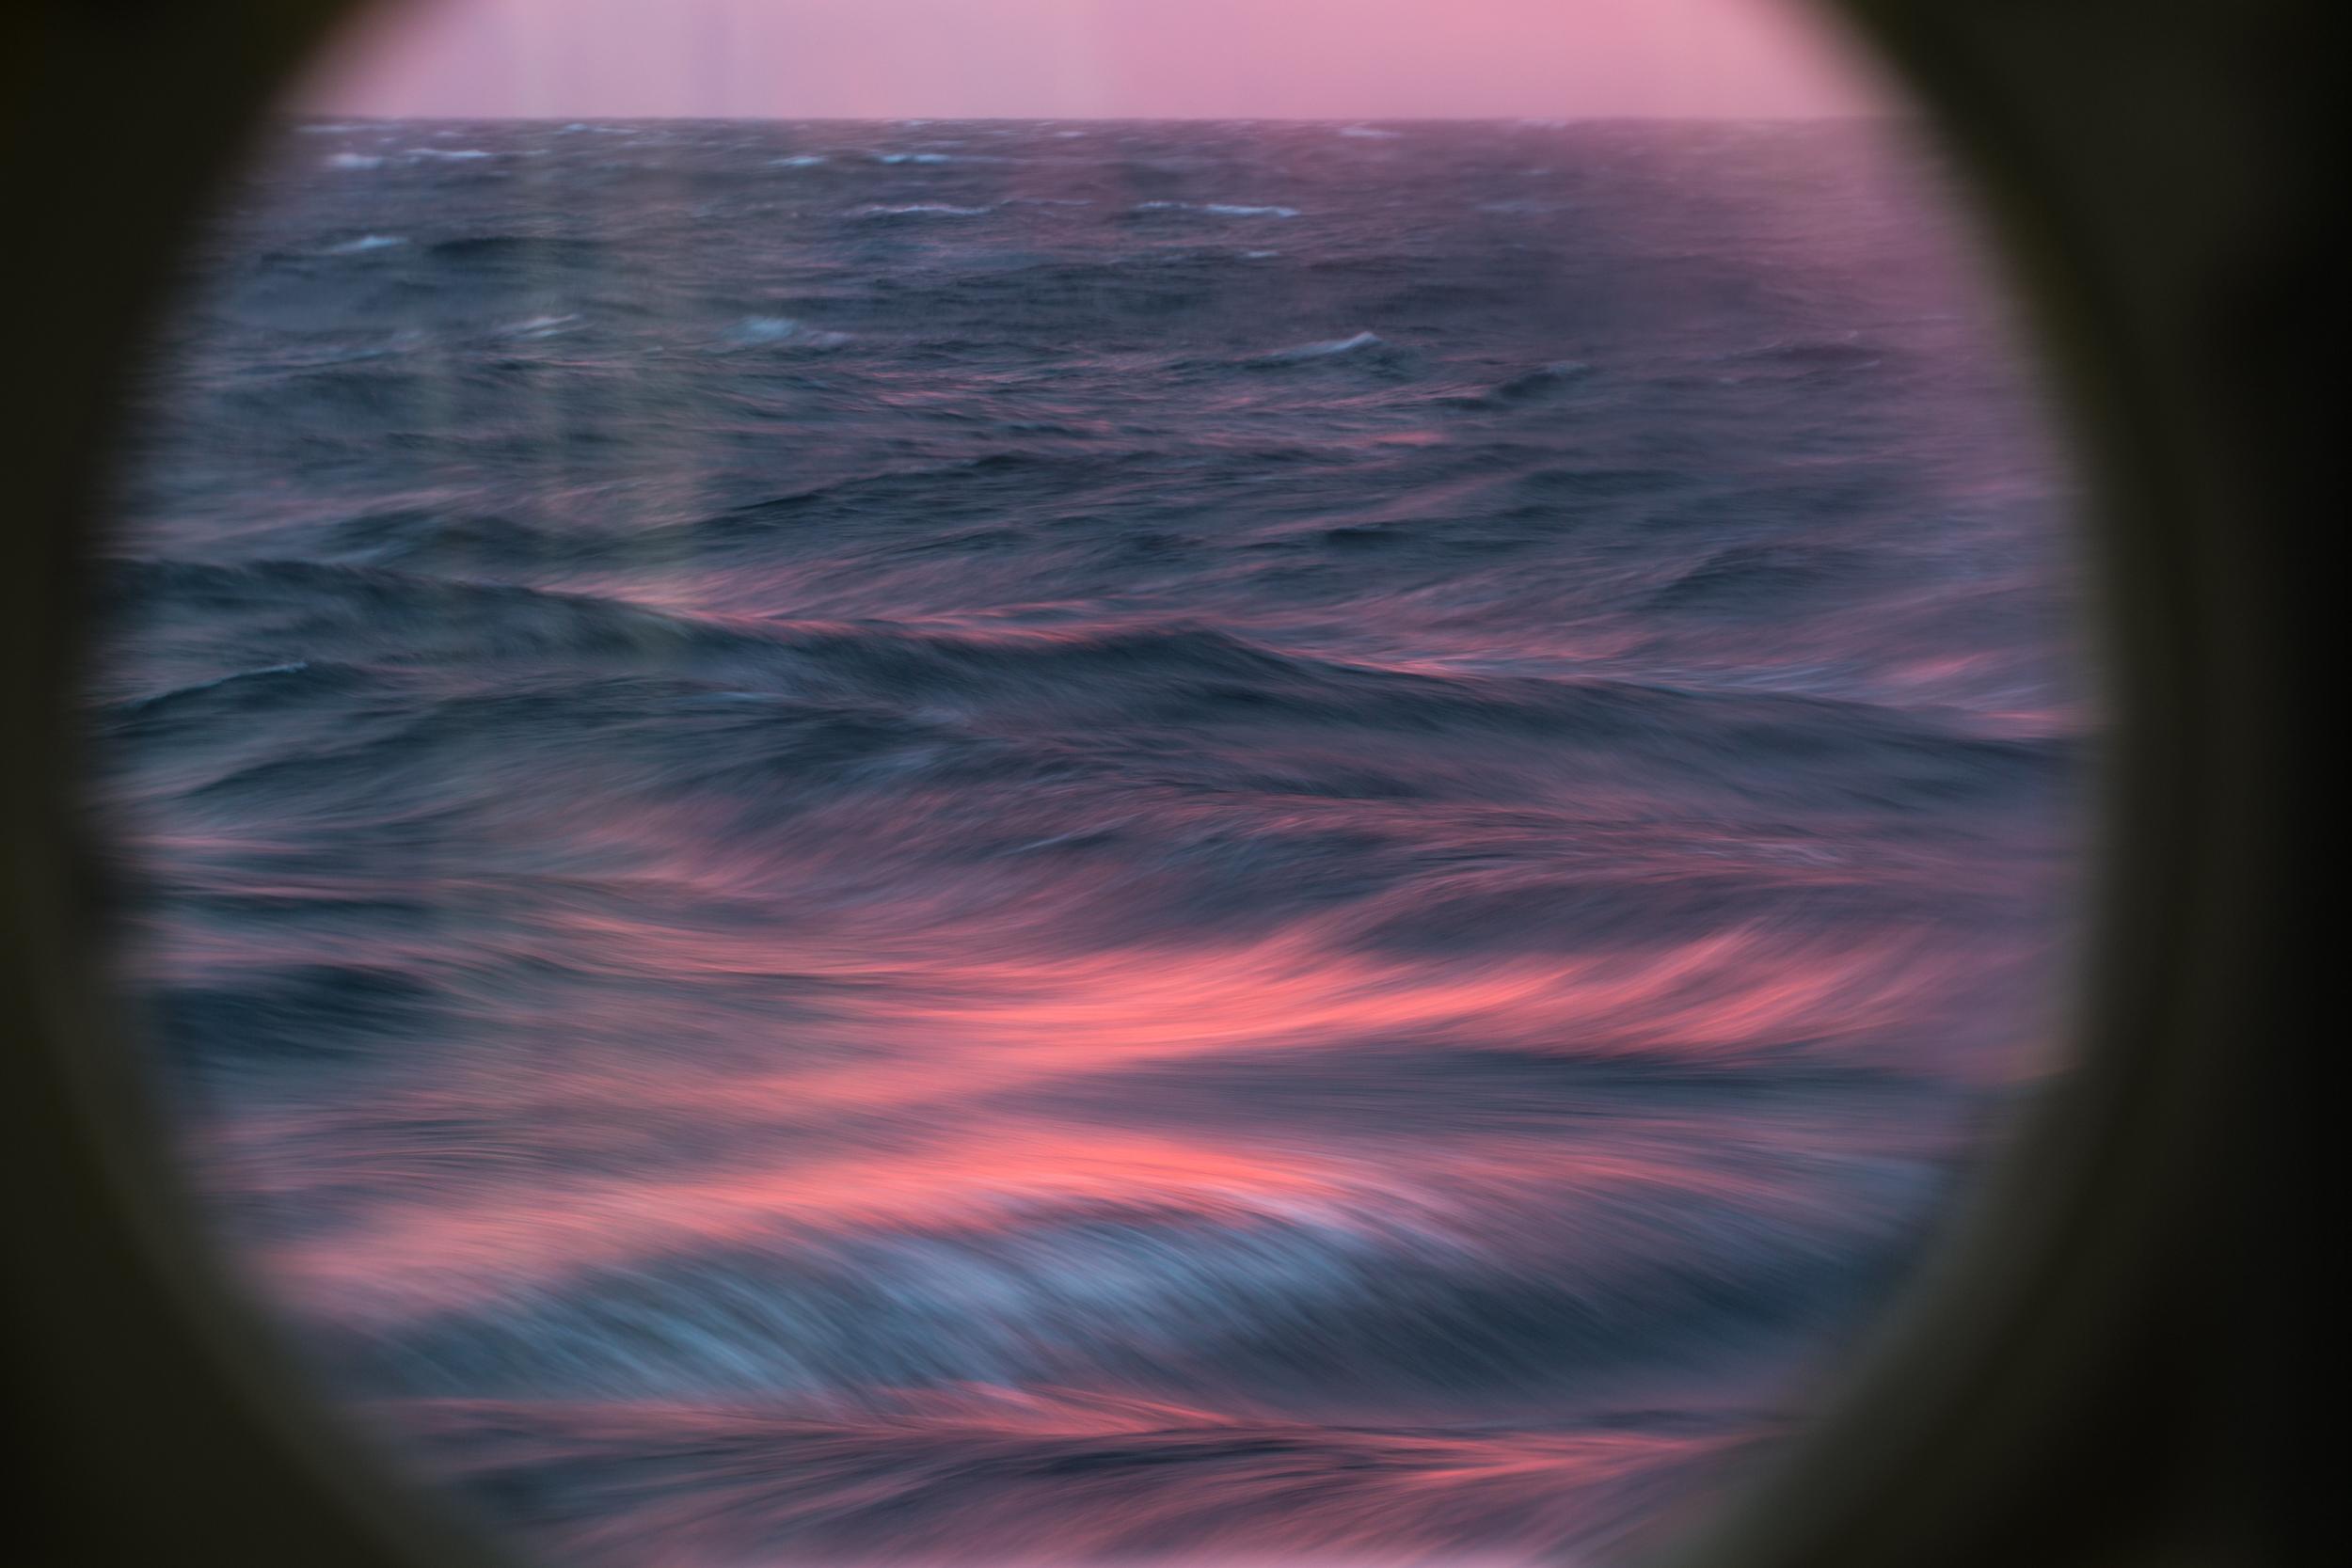 Scotia Sea, Southern Ocean, Antarctica